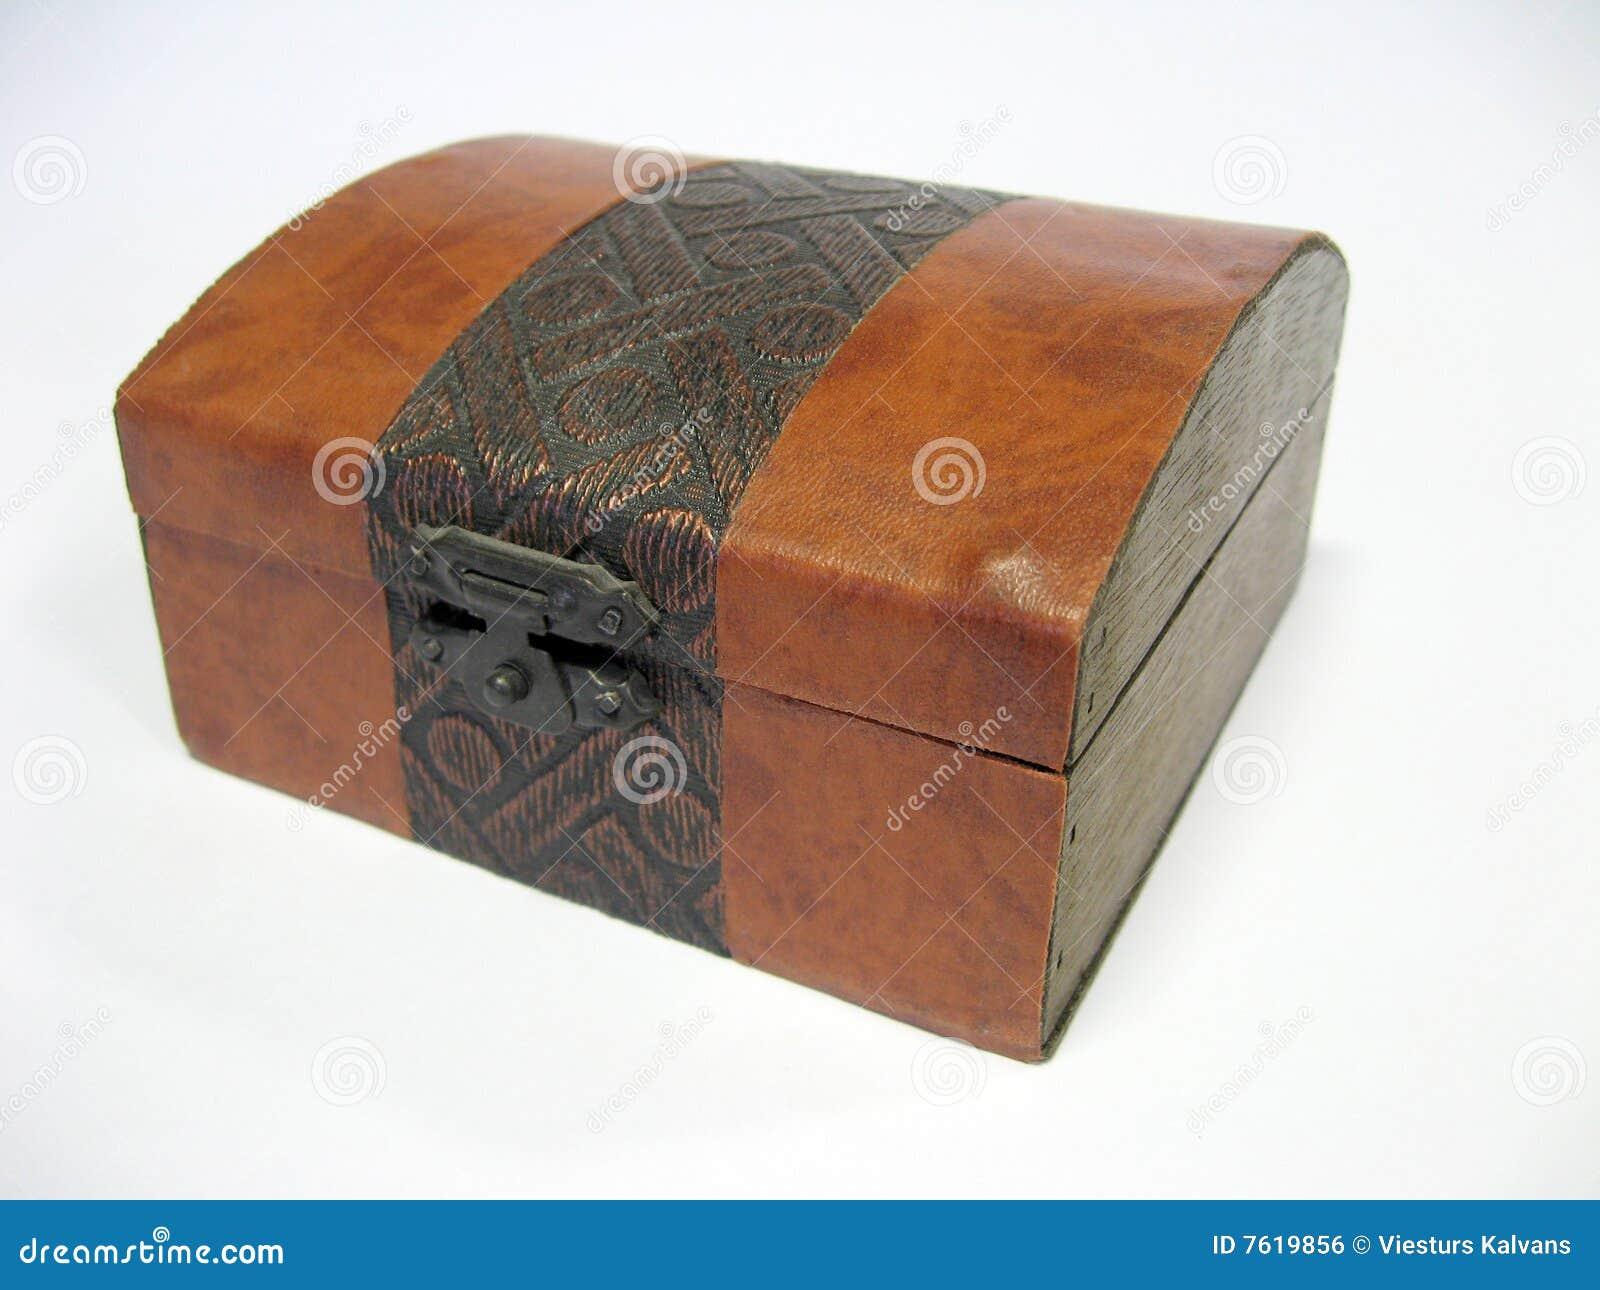 Decorative Box Plans Free : Decorative box royalty free stock image